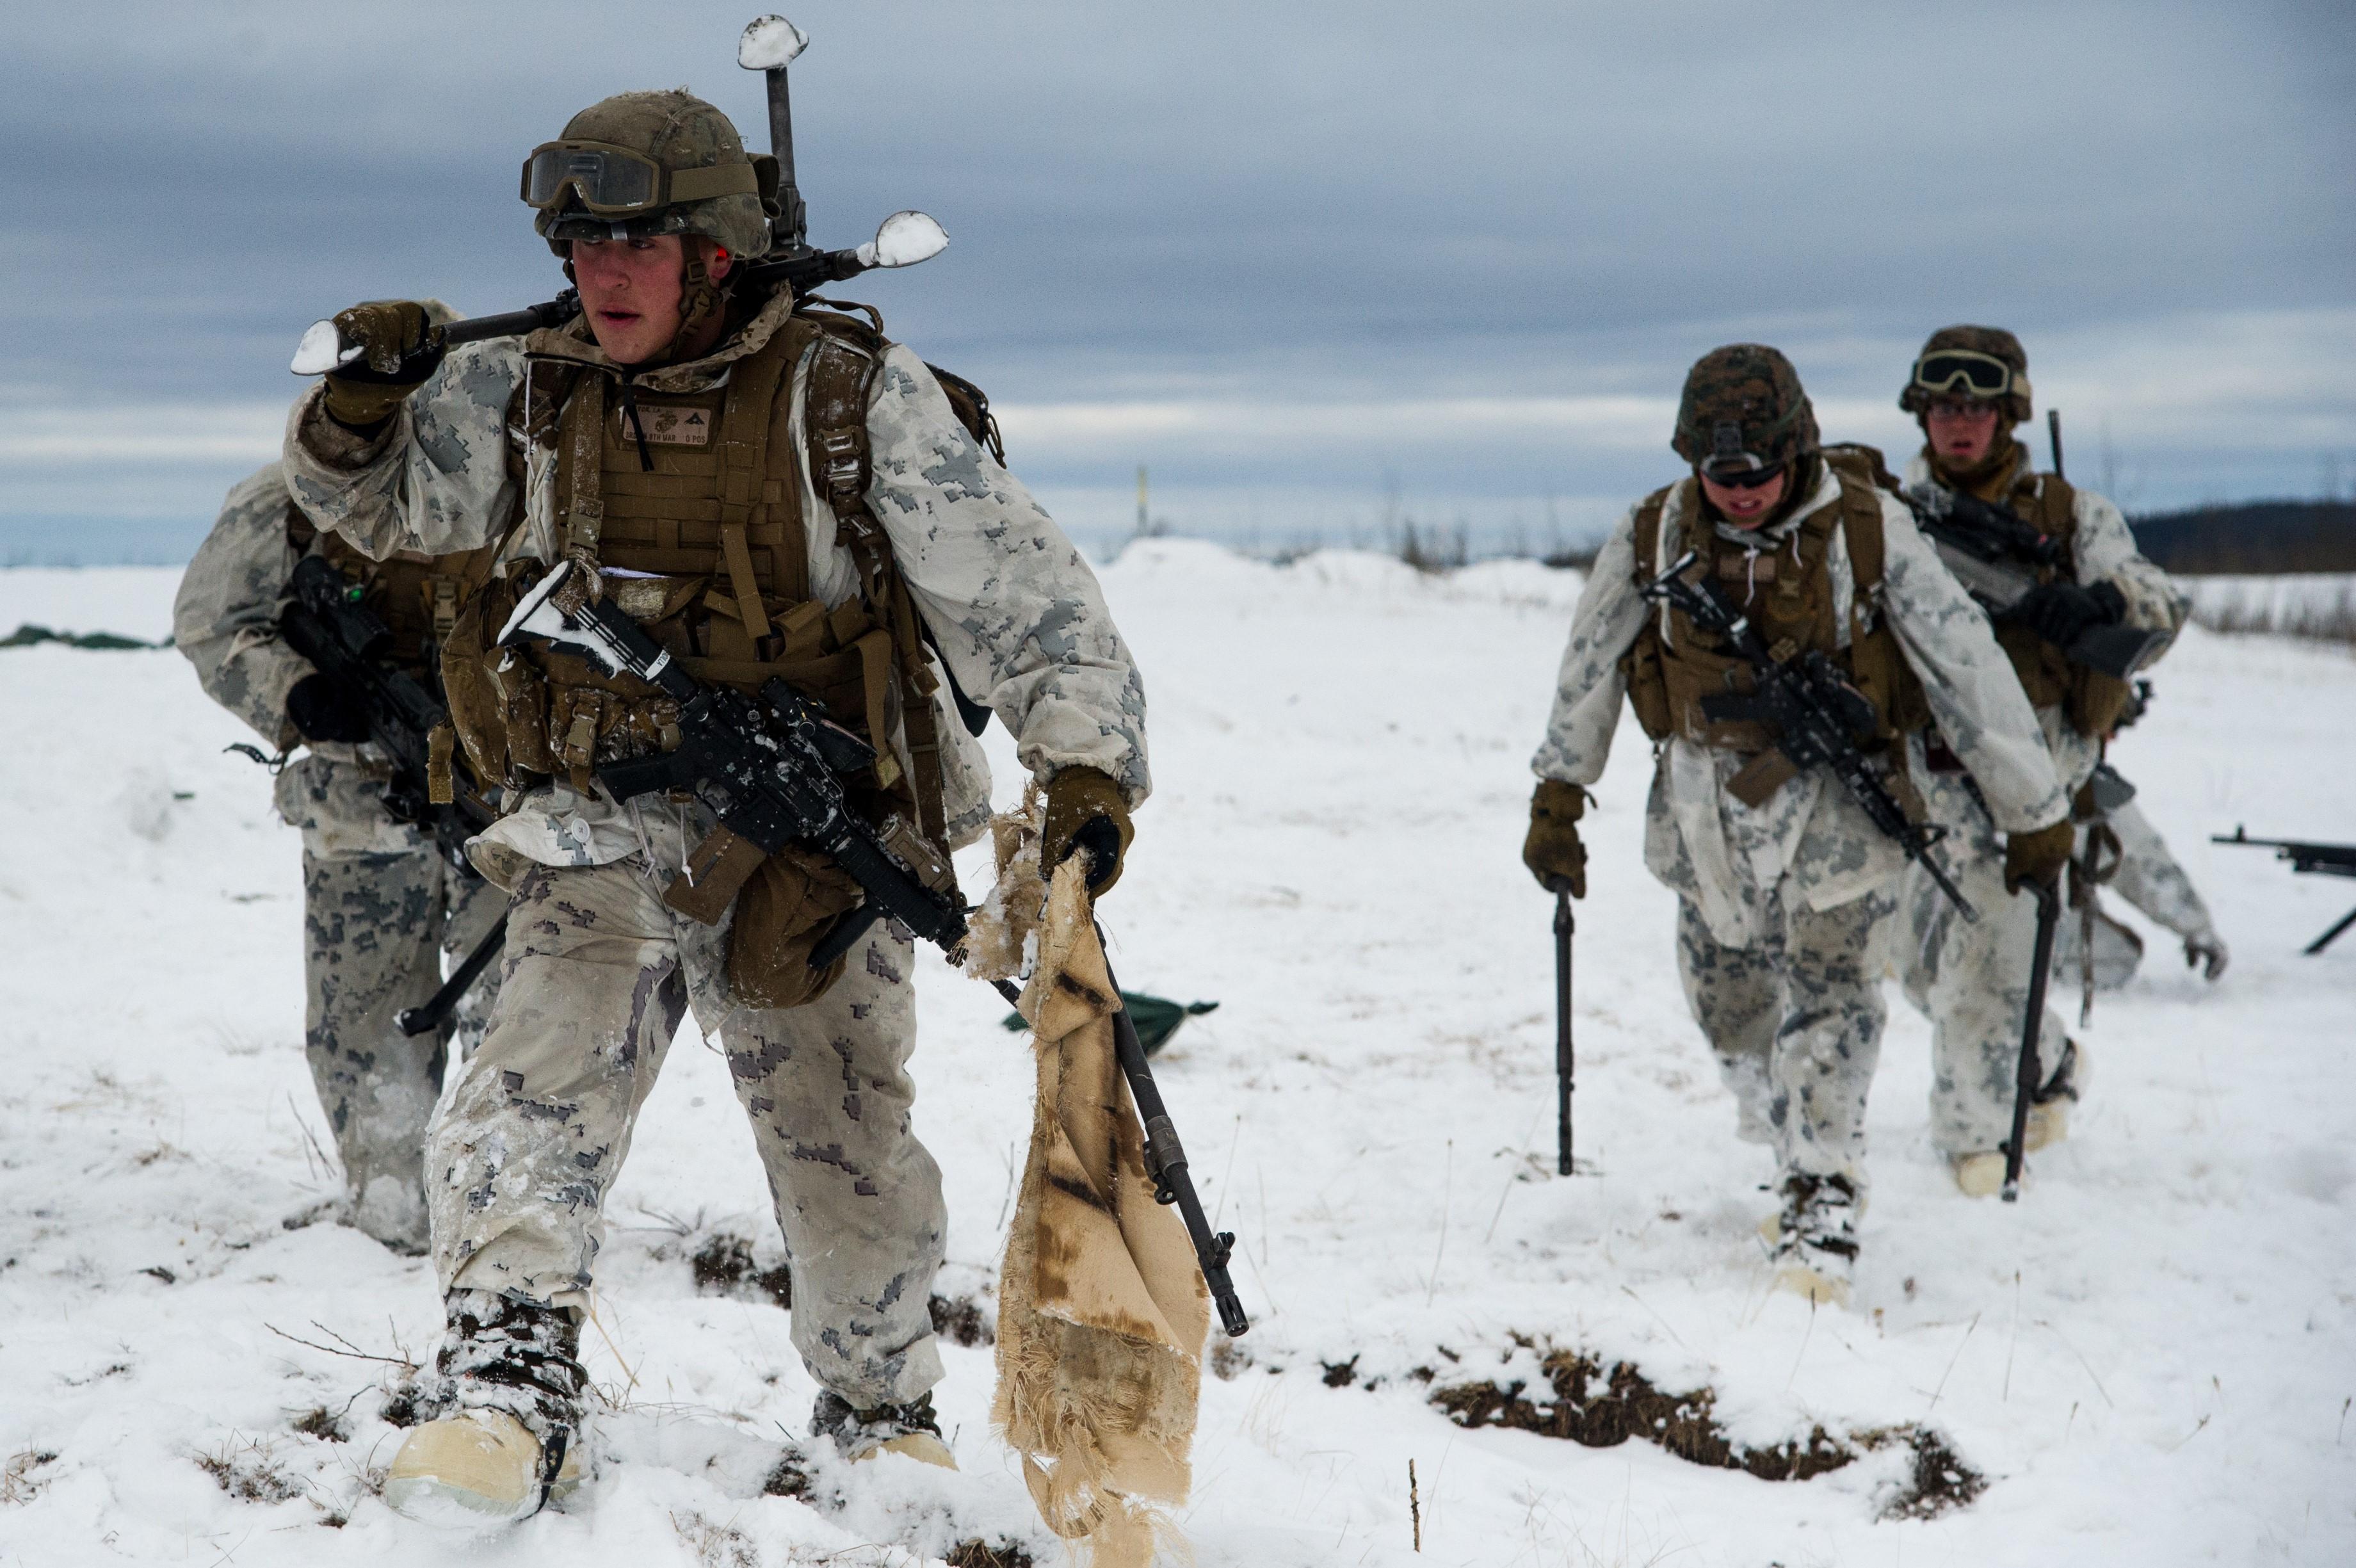 U.S Army • Exercise Arctic Edge • Airborne Operations